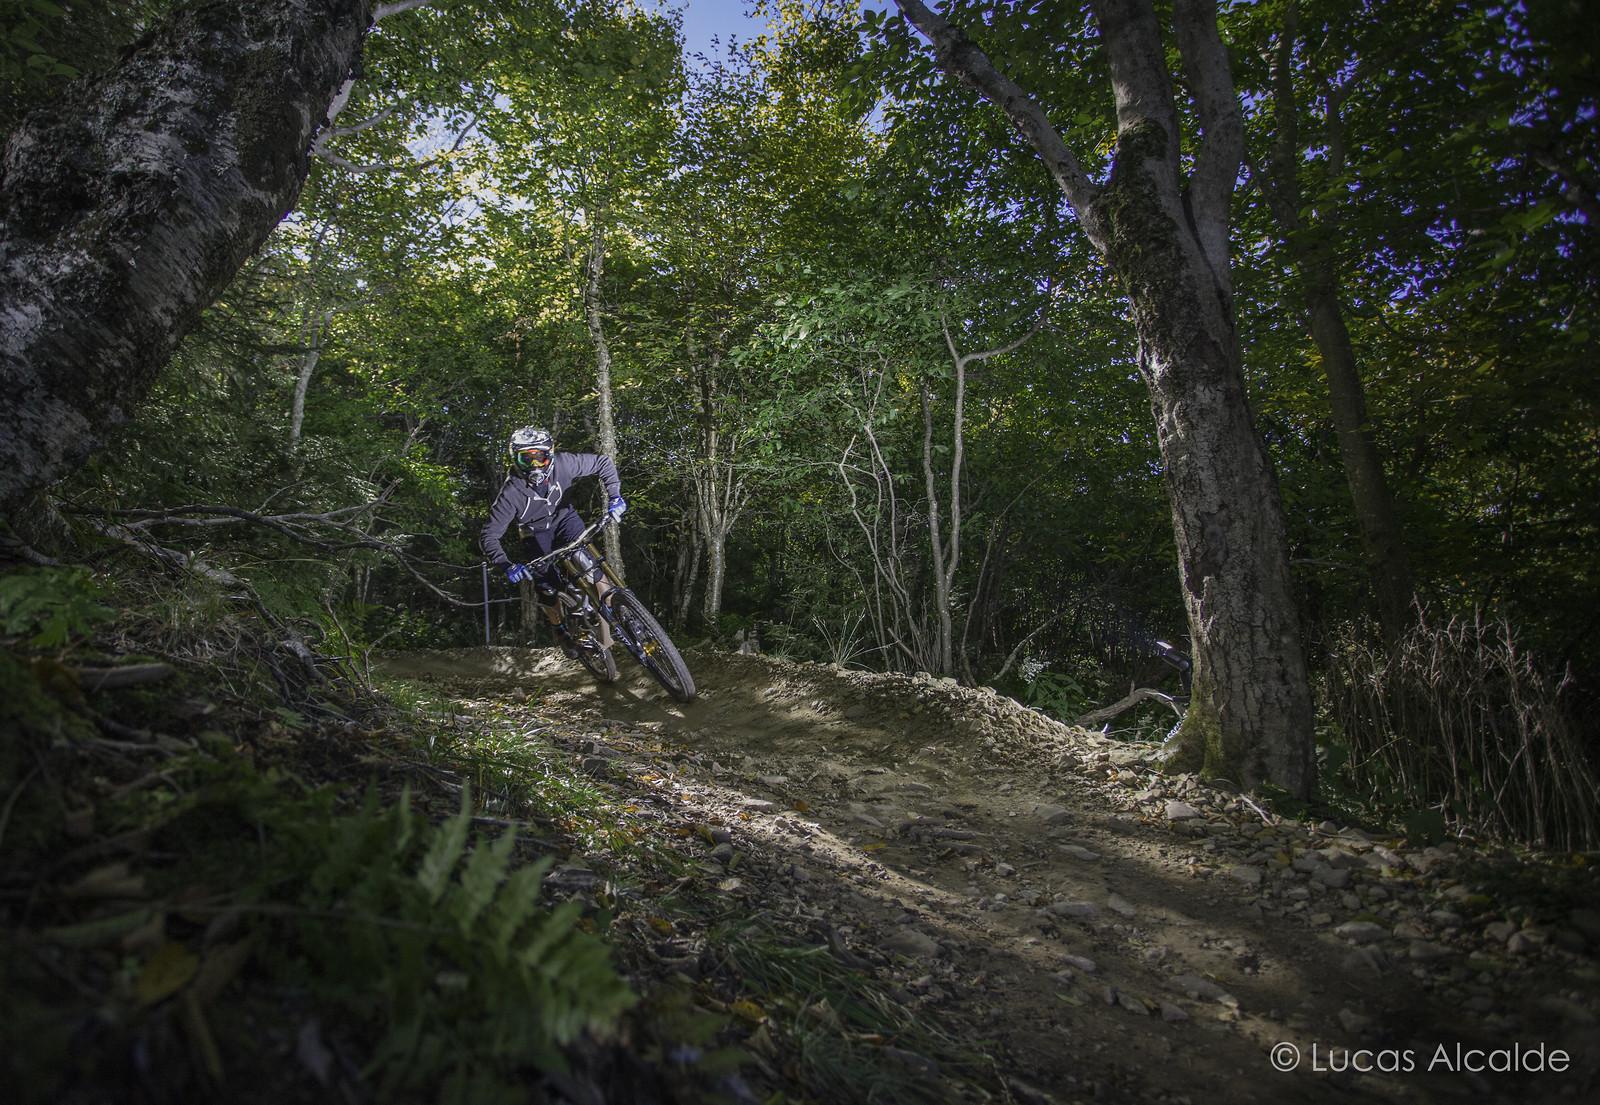 Mike Thomas + Snowshoe = Shred! - Lucas_Alcalde - Mountain Biking Pictures - Vital MTB